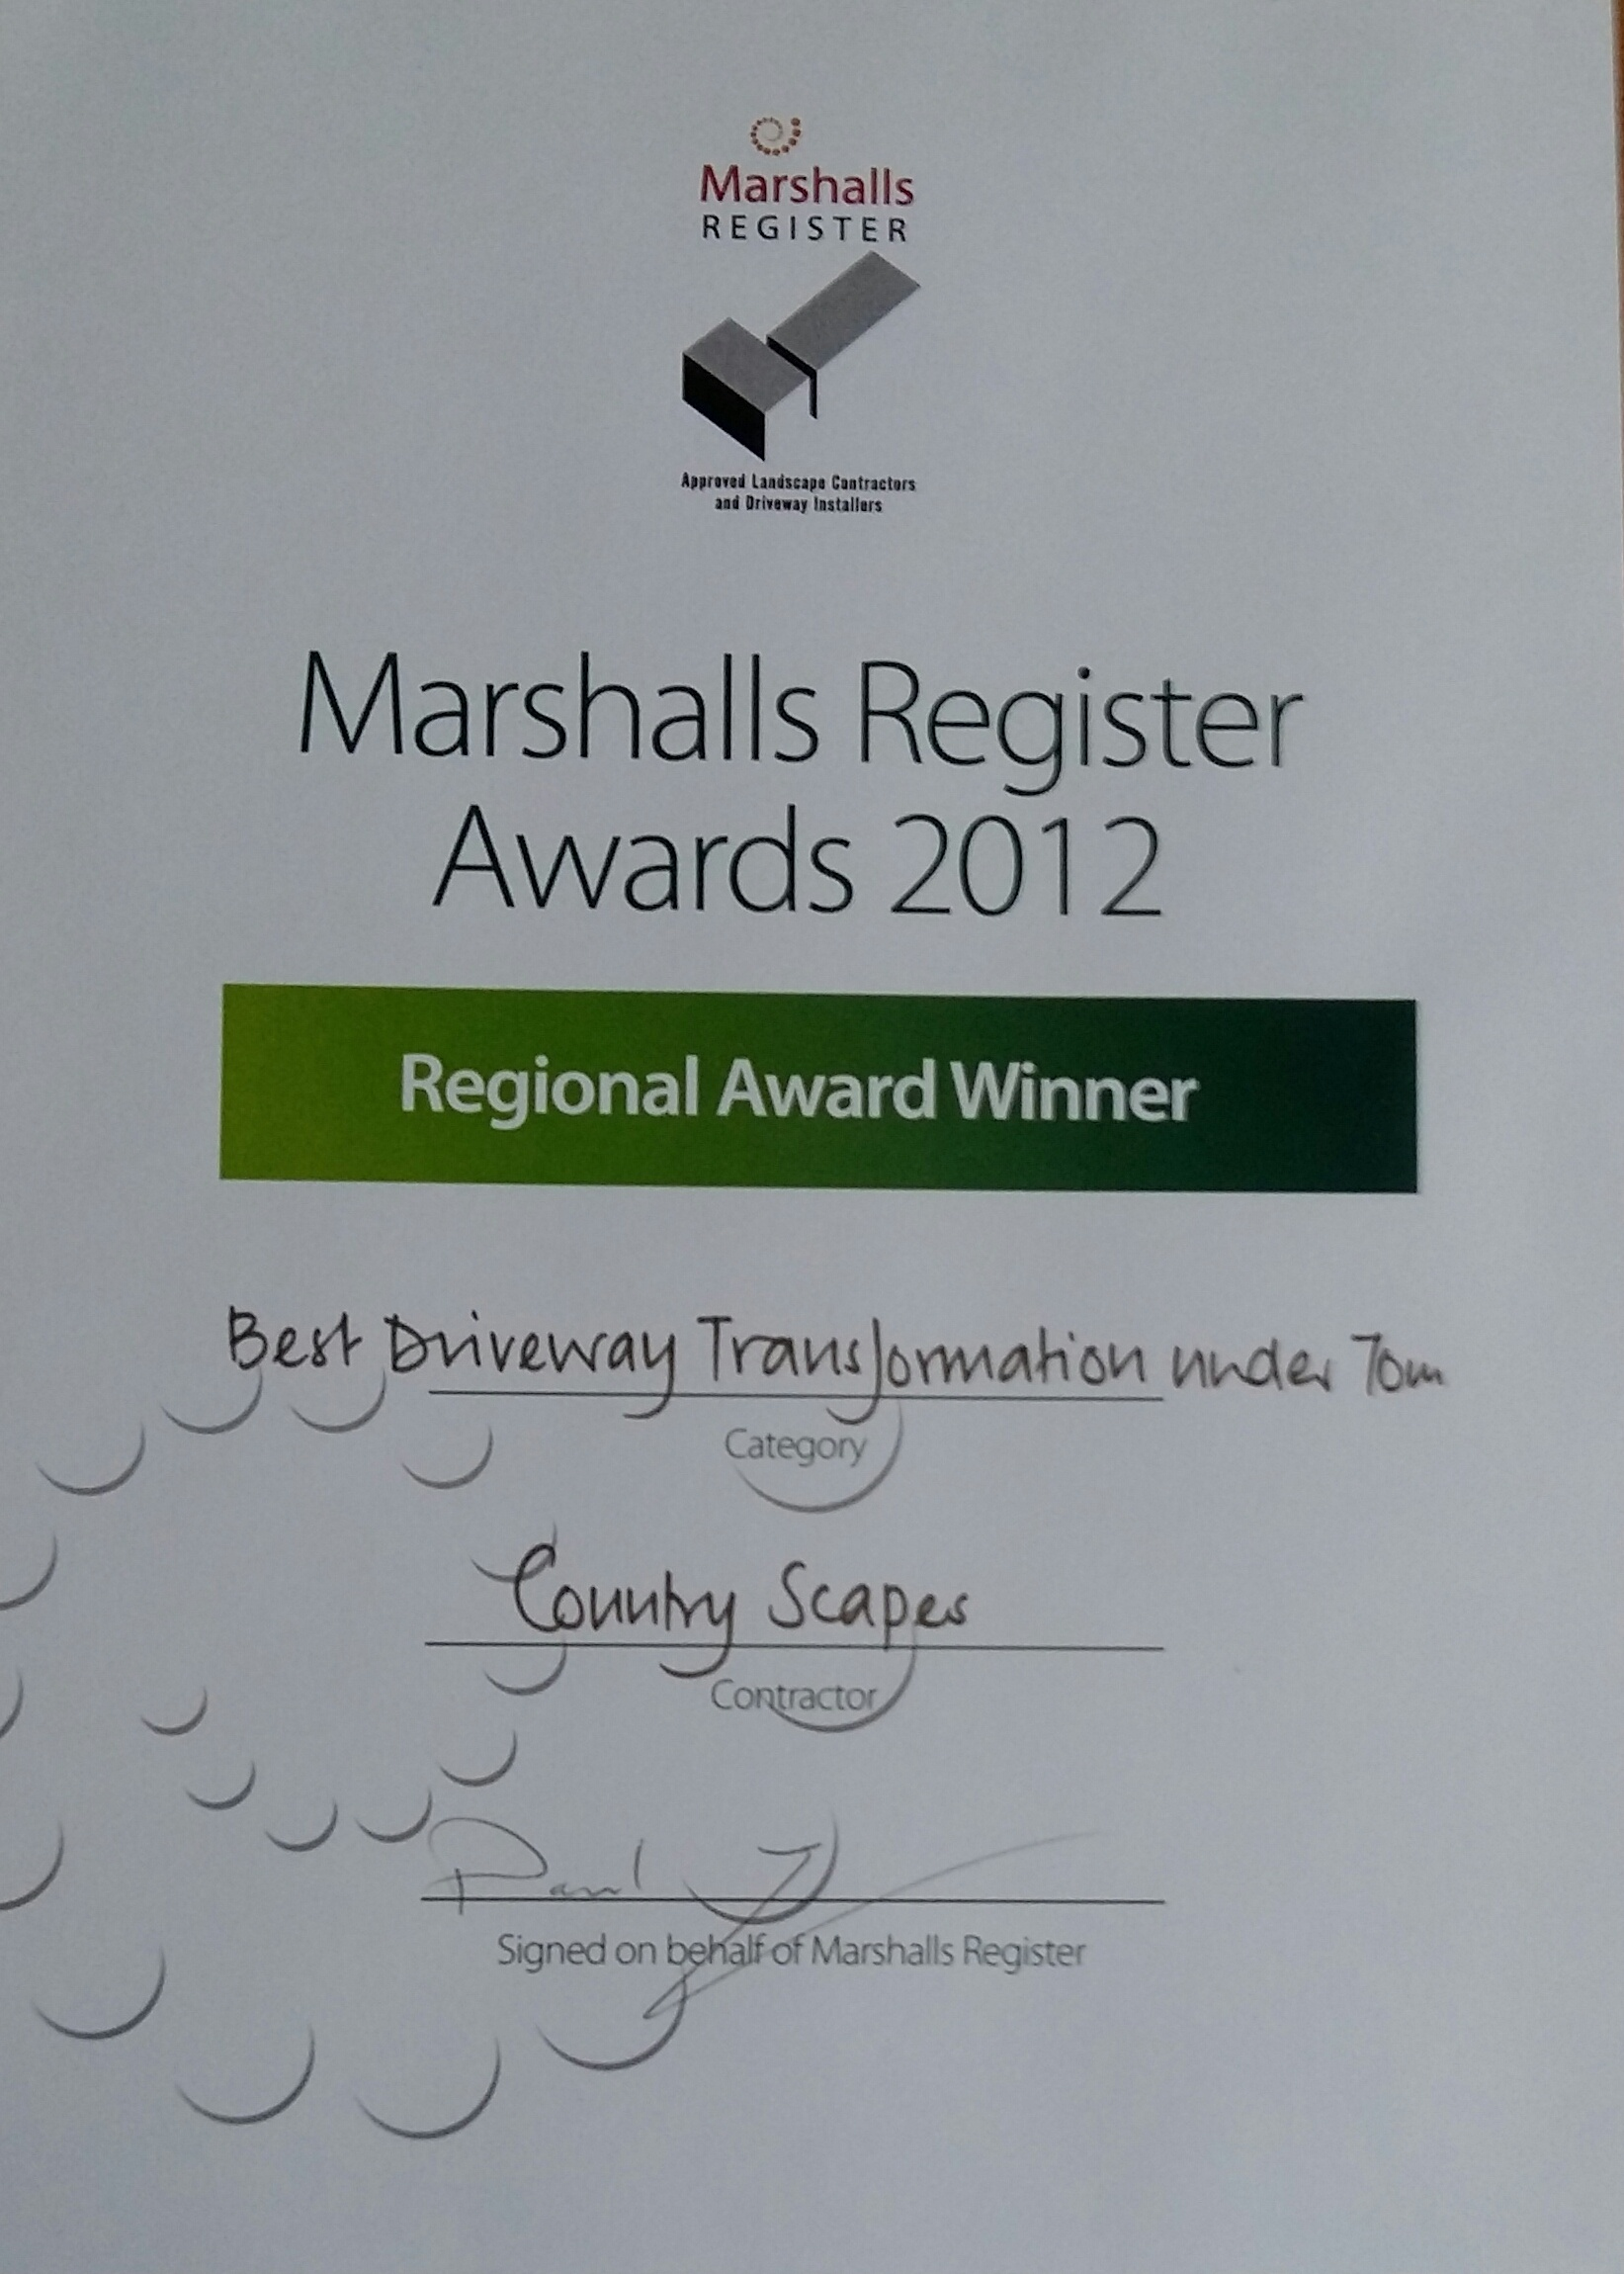 Driveway Transformation Award